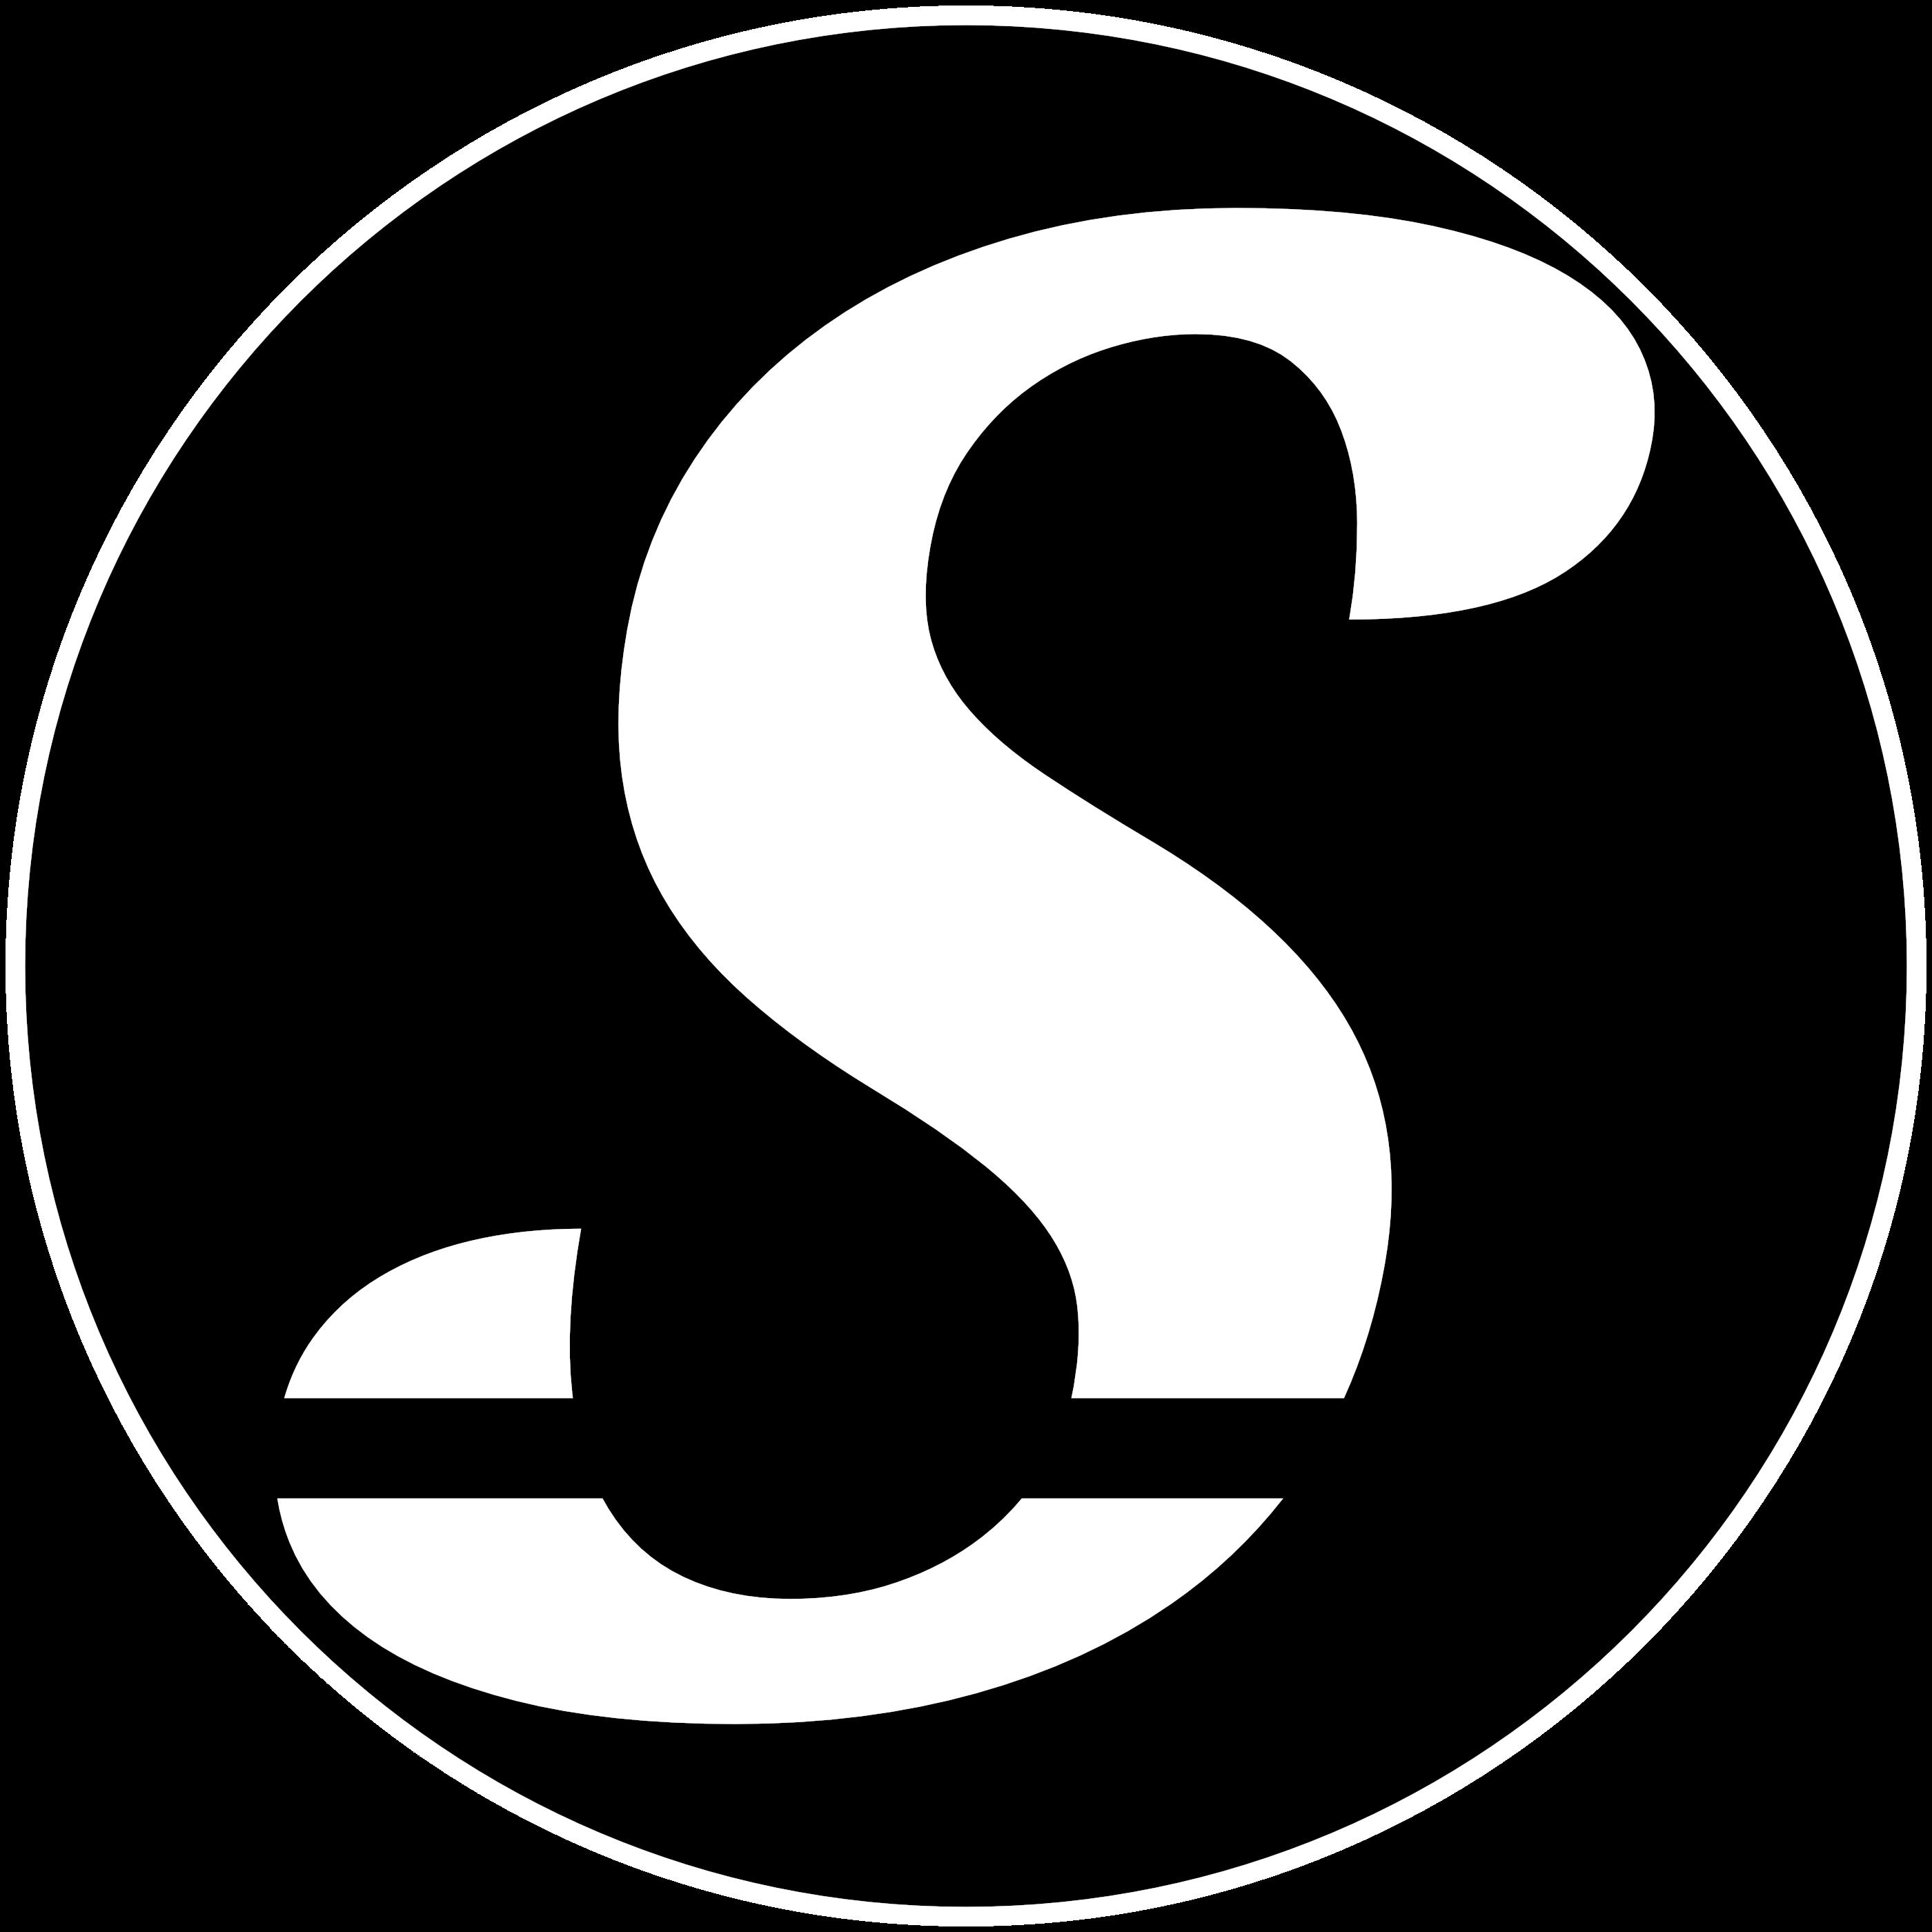 "Sheekore ""S"" monochrome white logo."